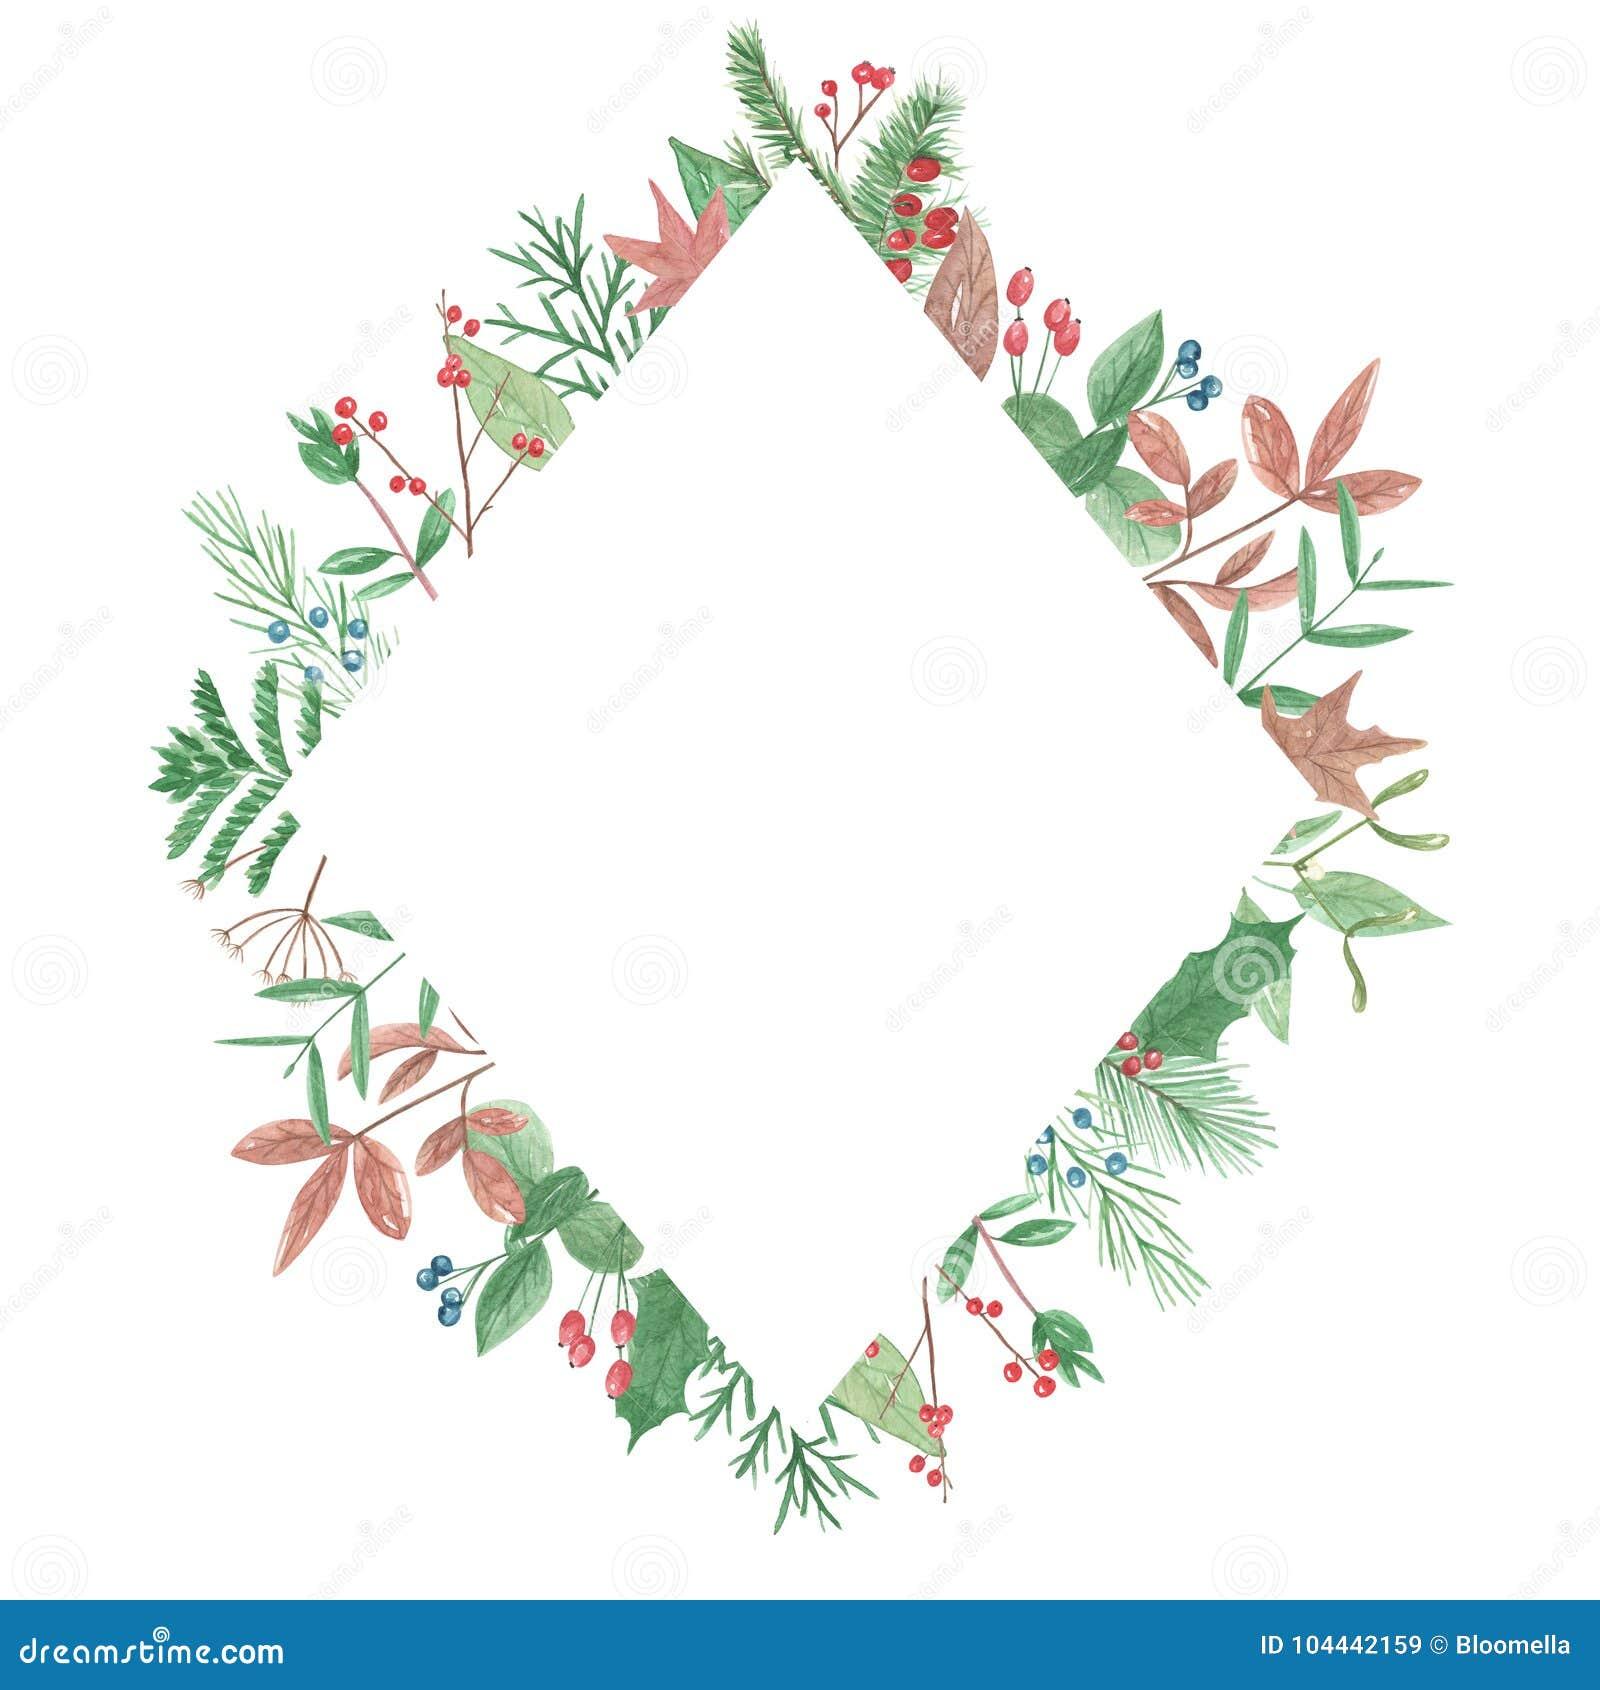 c686fb722431 Watercolor Foliage Diamond Border Frame Winter Berries Leaves ...